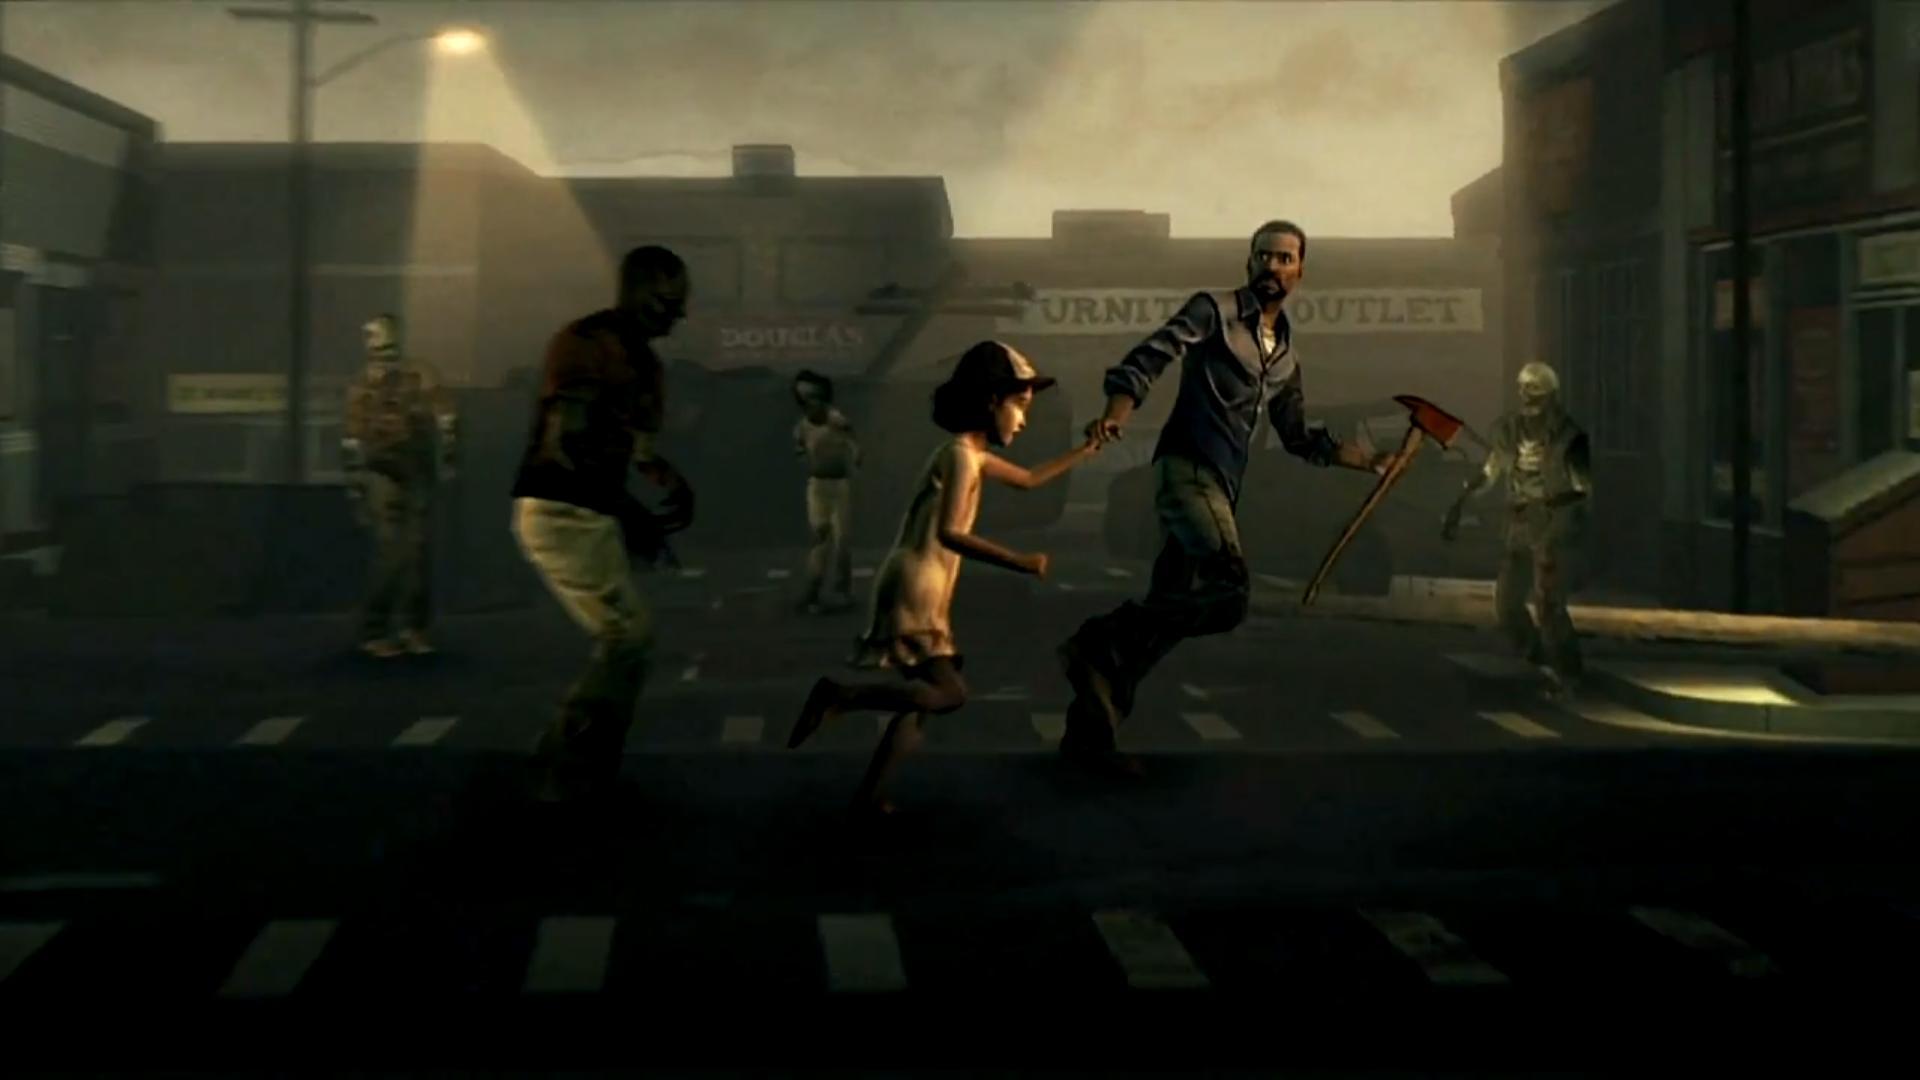 Pics Photos   The Walking Dead Game Ps3 Wallpaper Hd Hd 1920x1080